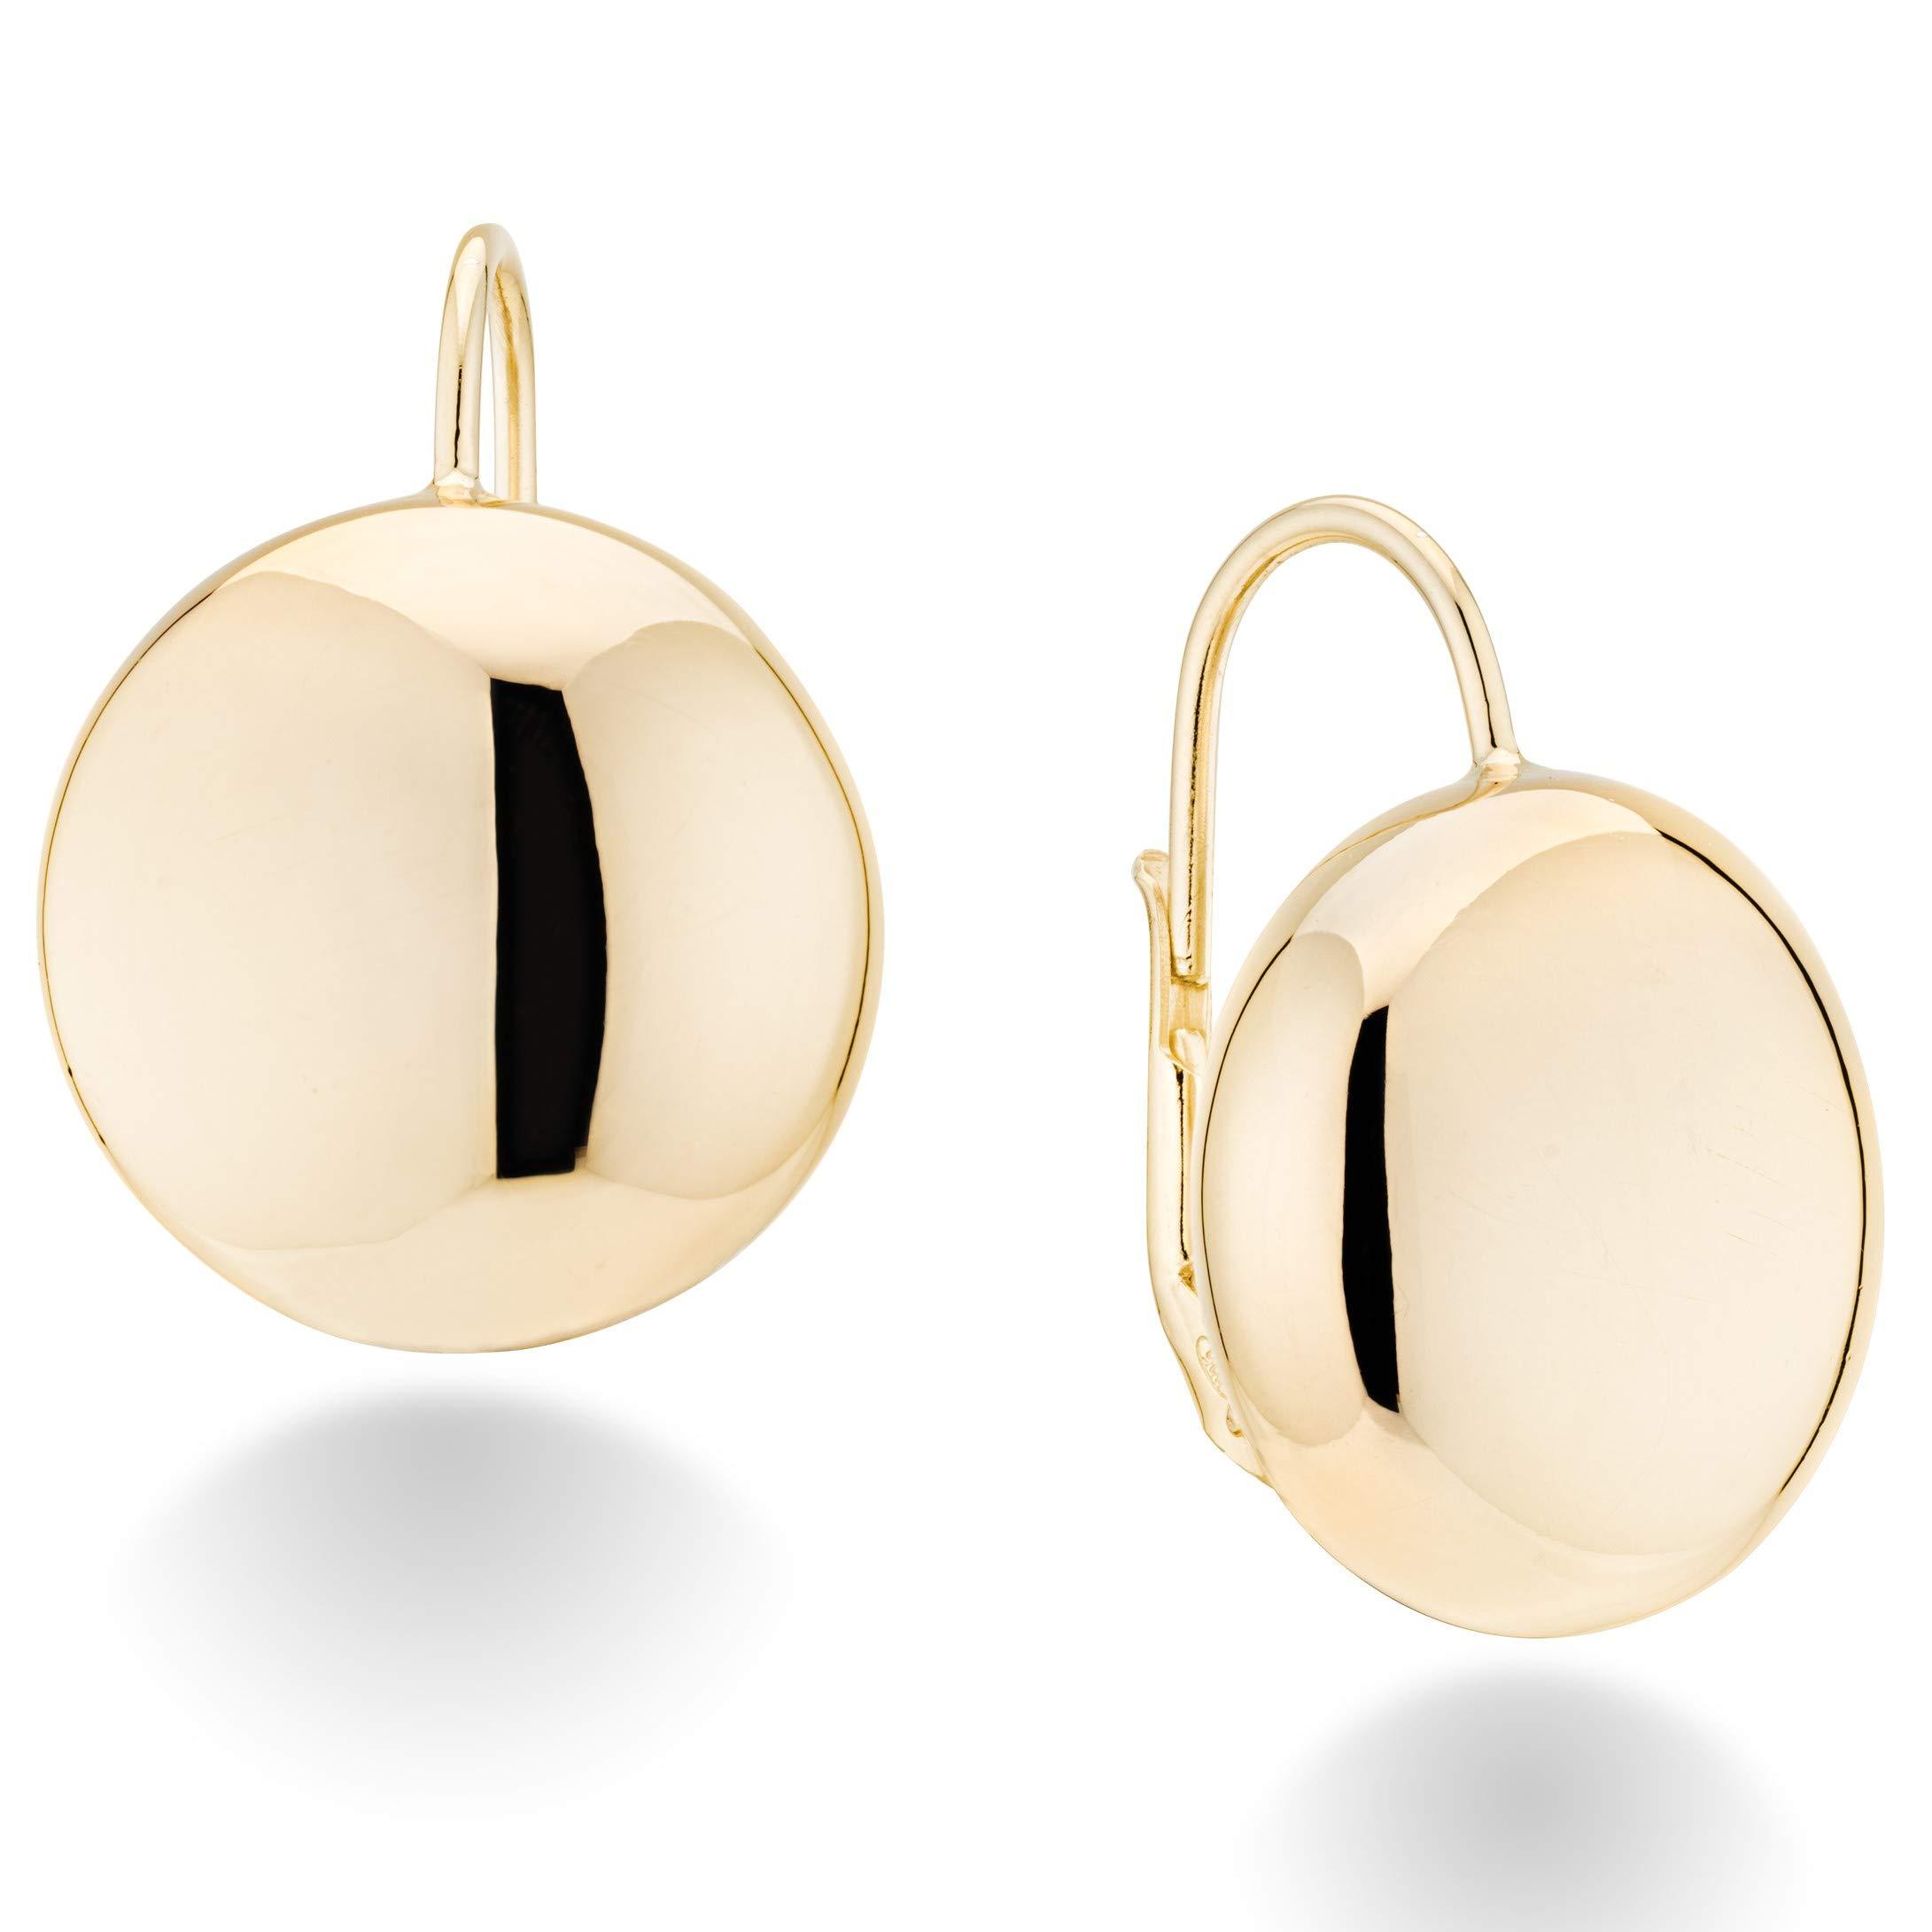 MiaBella 18K Gold Over Sterling Silver Italian Flattened Bead Ball Statement Leverback Earrings, 12mm, 18mm (18)